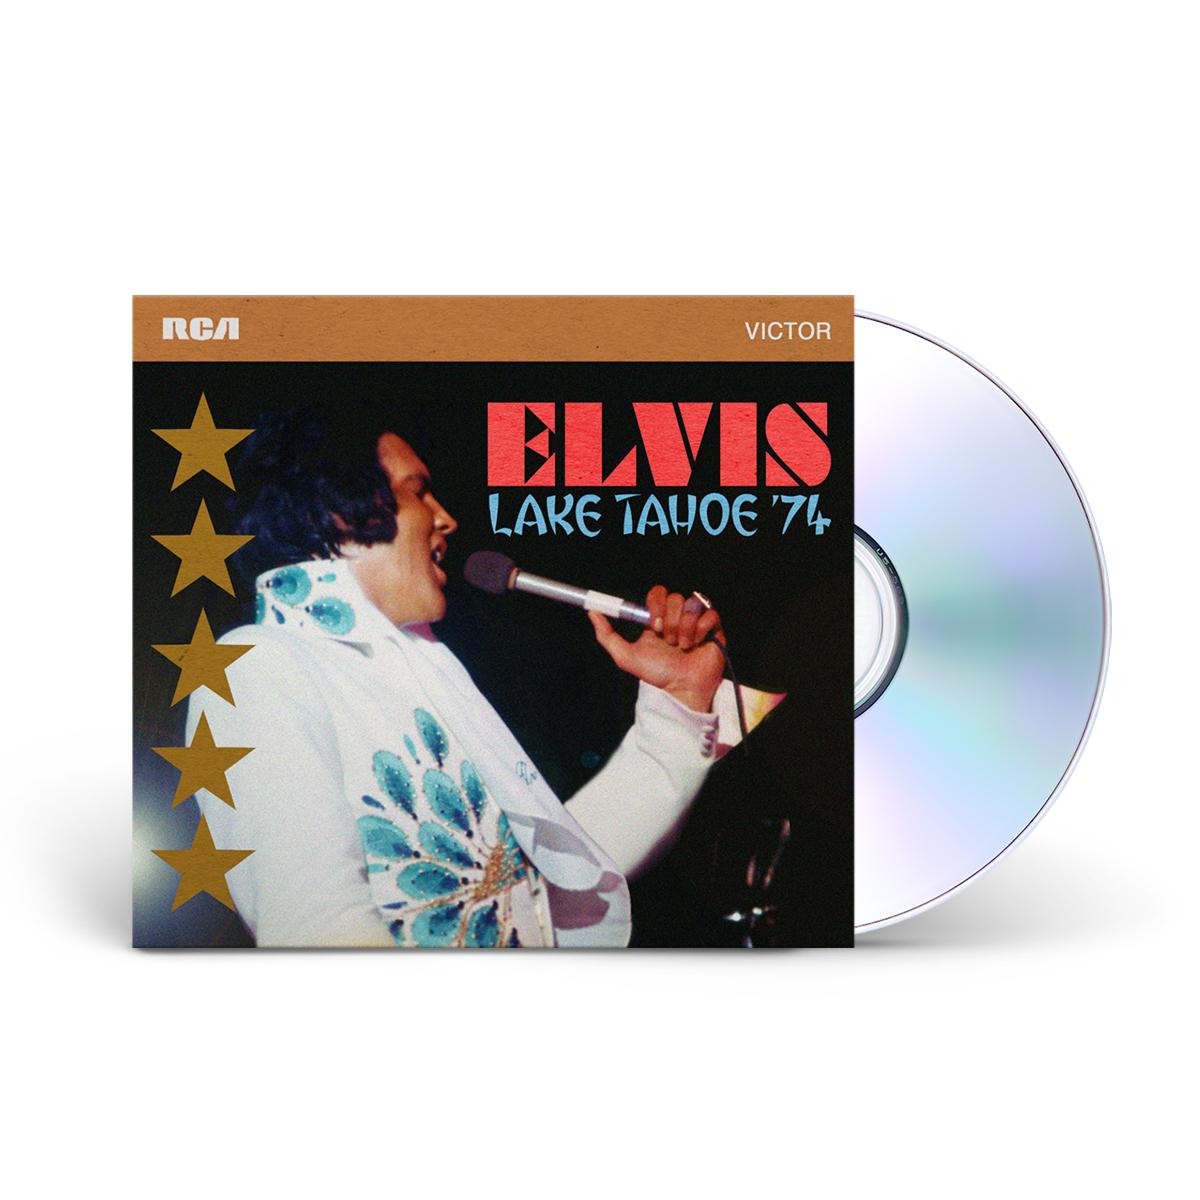 Elvis Lake Tahoe '74 FTD 2-CD Set